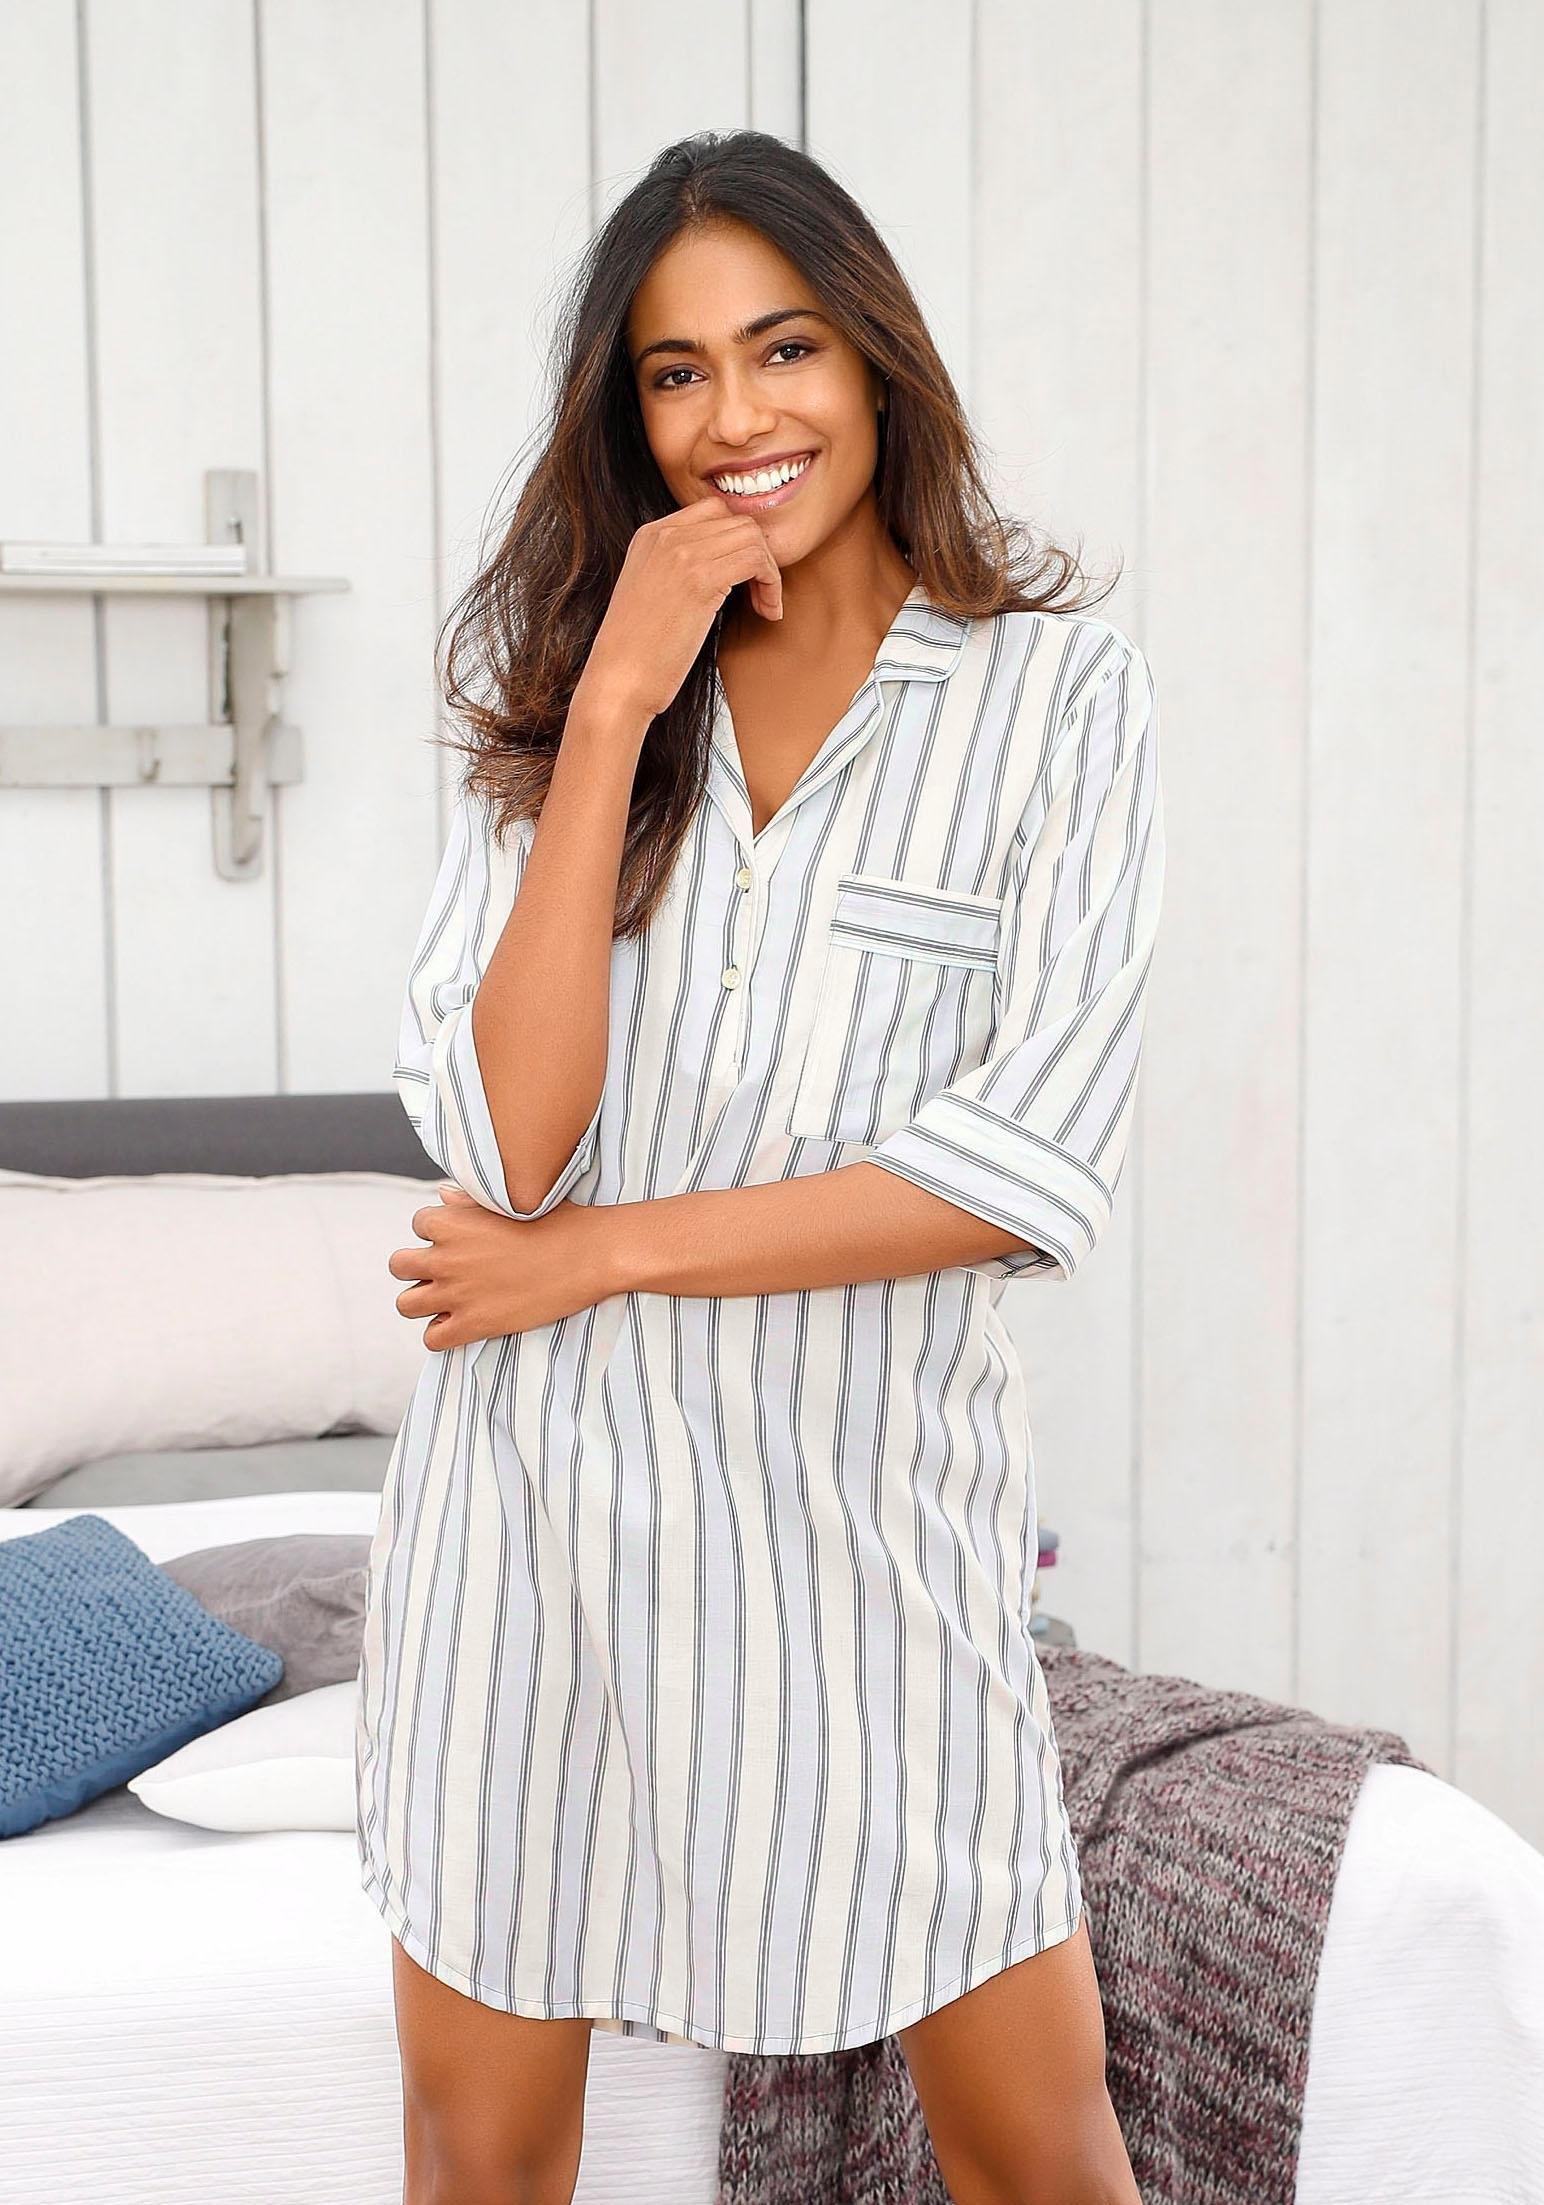 Lascana nachthemd met klassieke reverskraag - gratis ruilen op lascana.nl